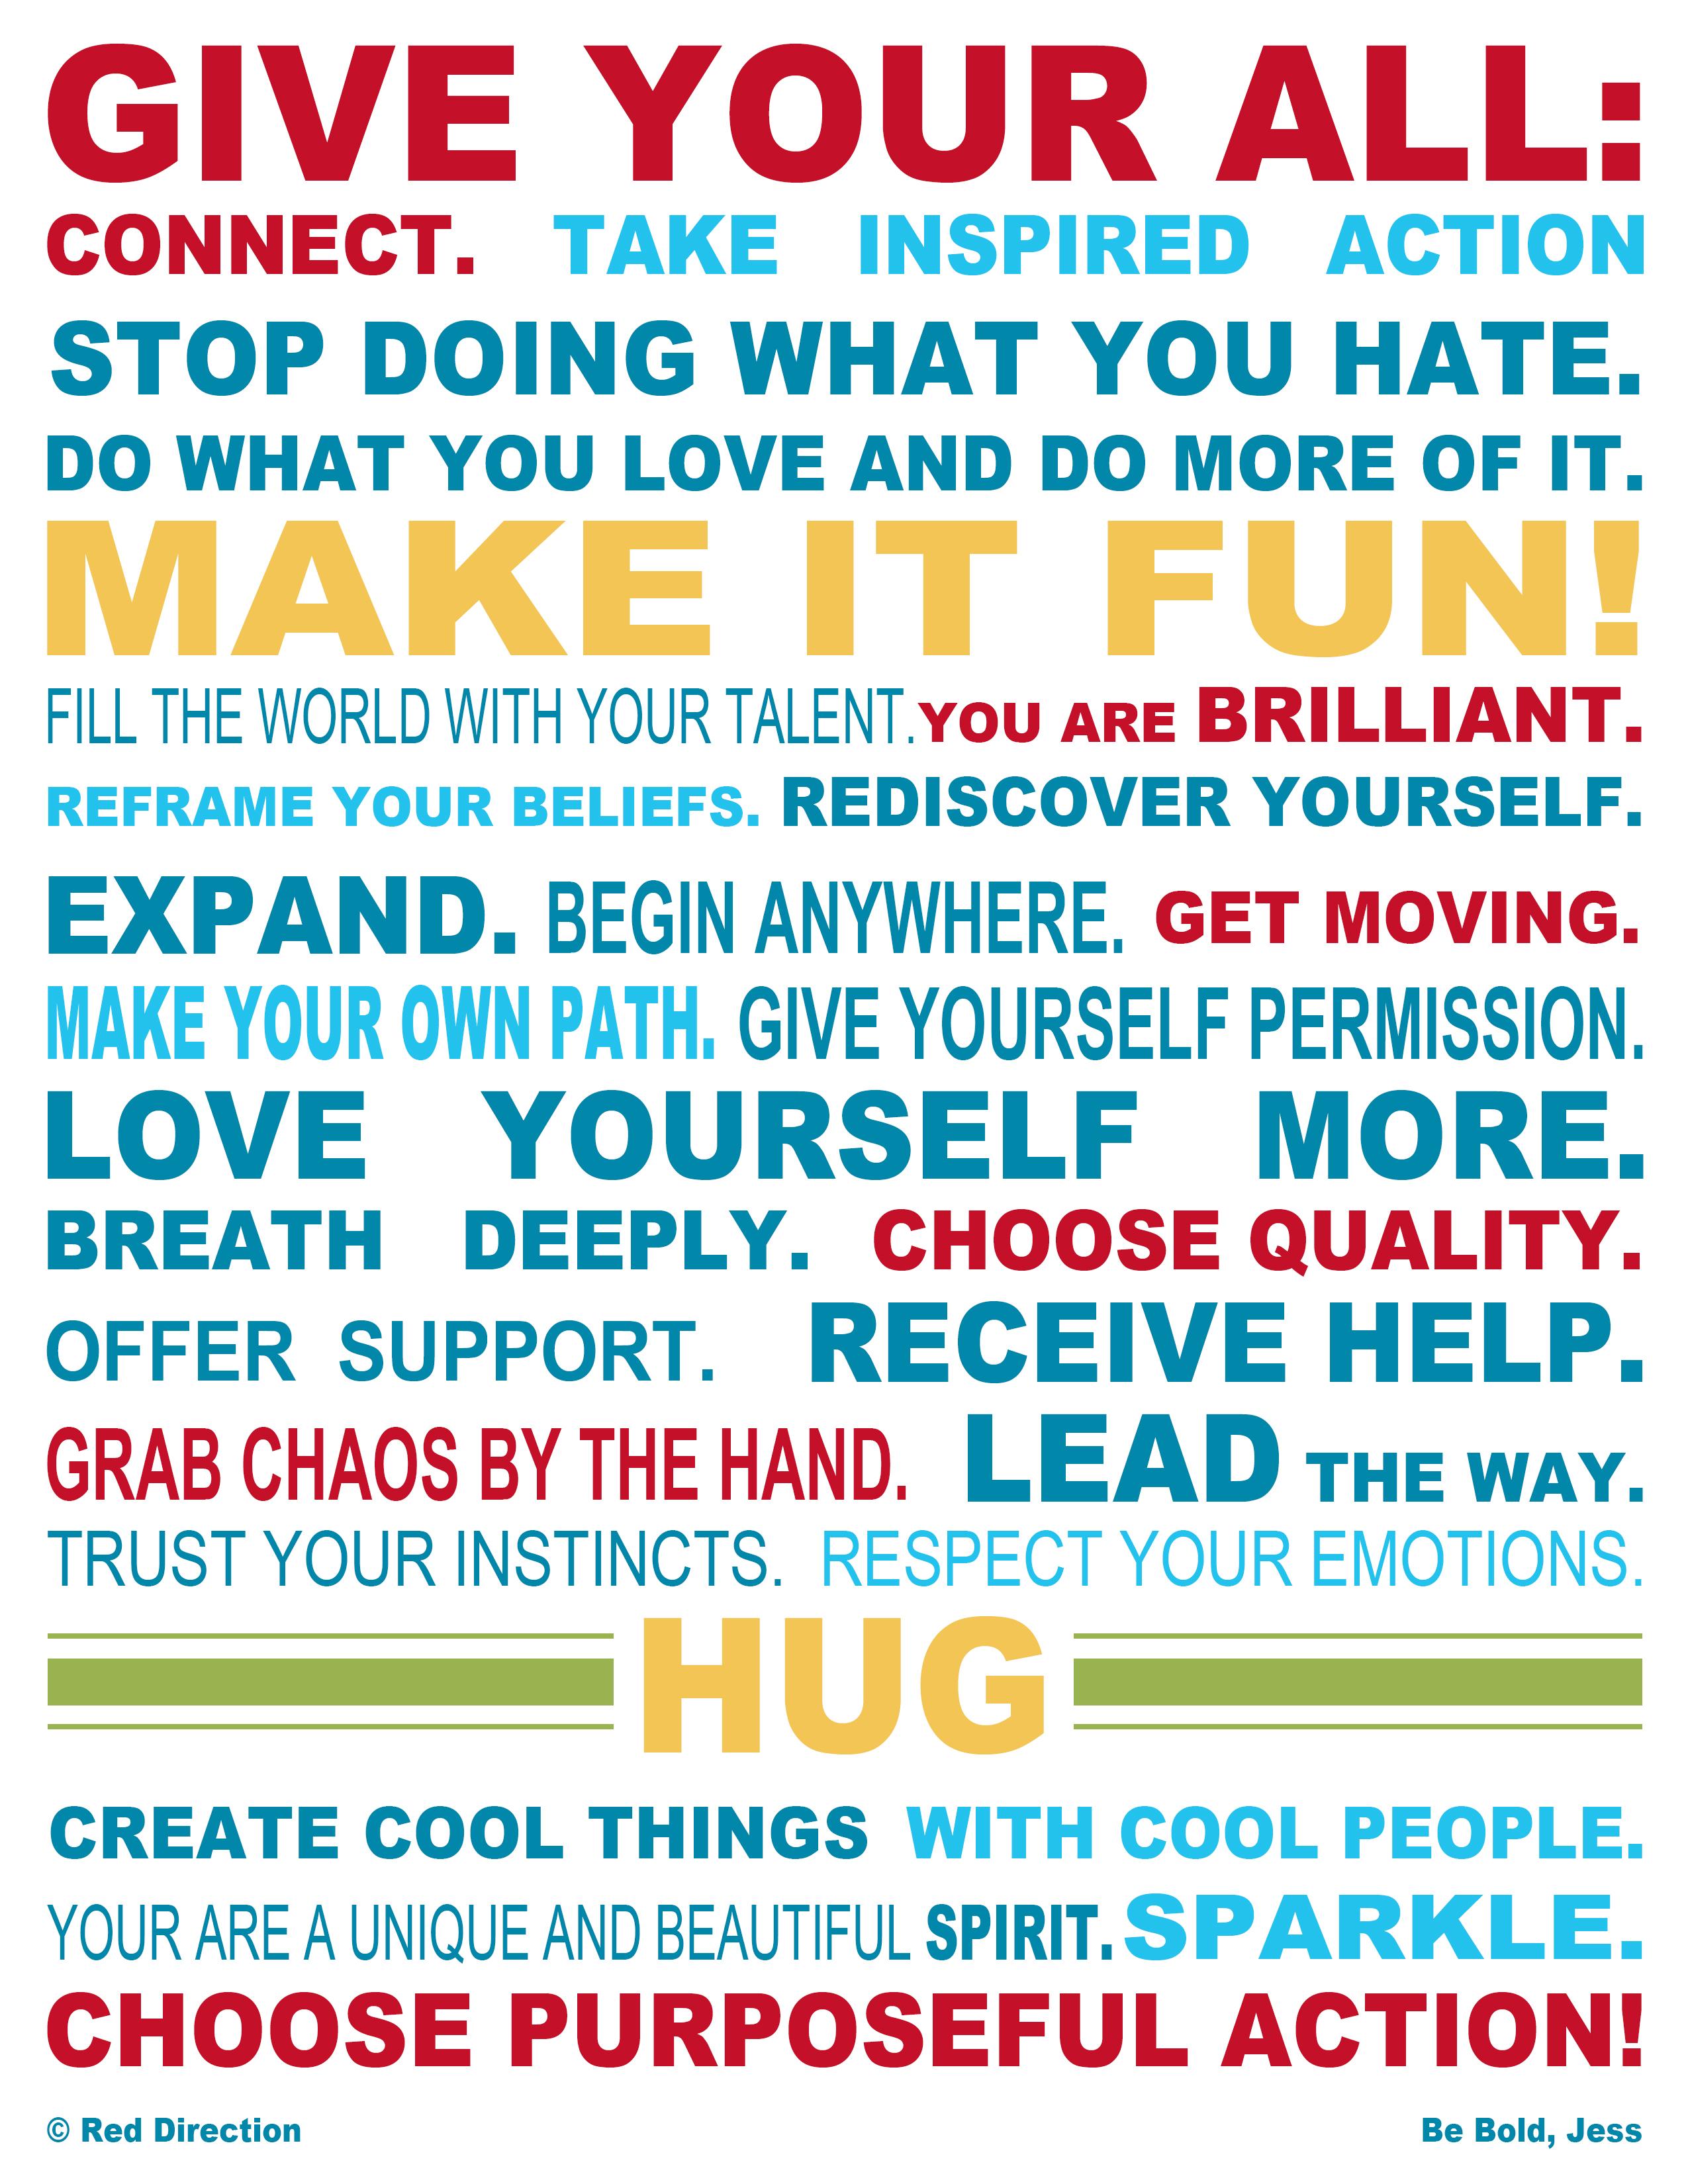 Red Direction Manifesto